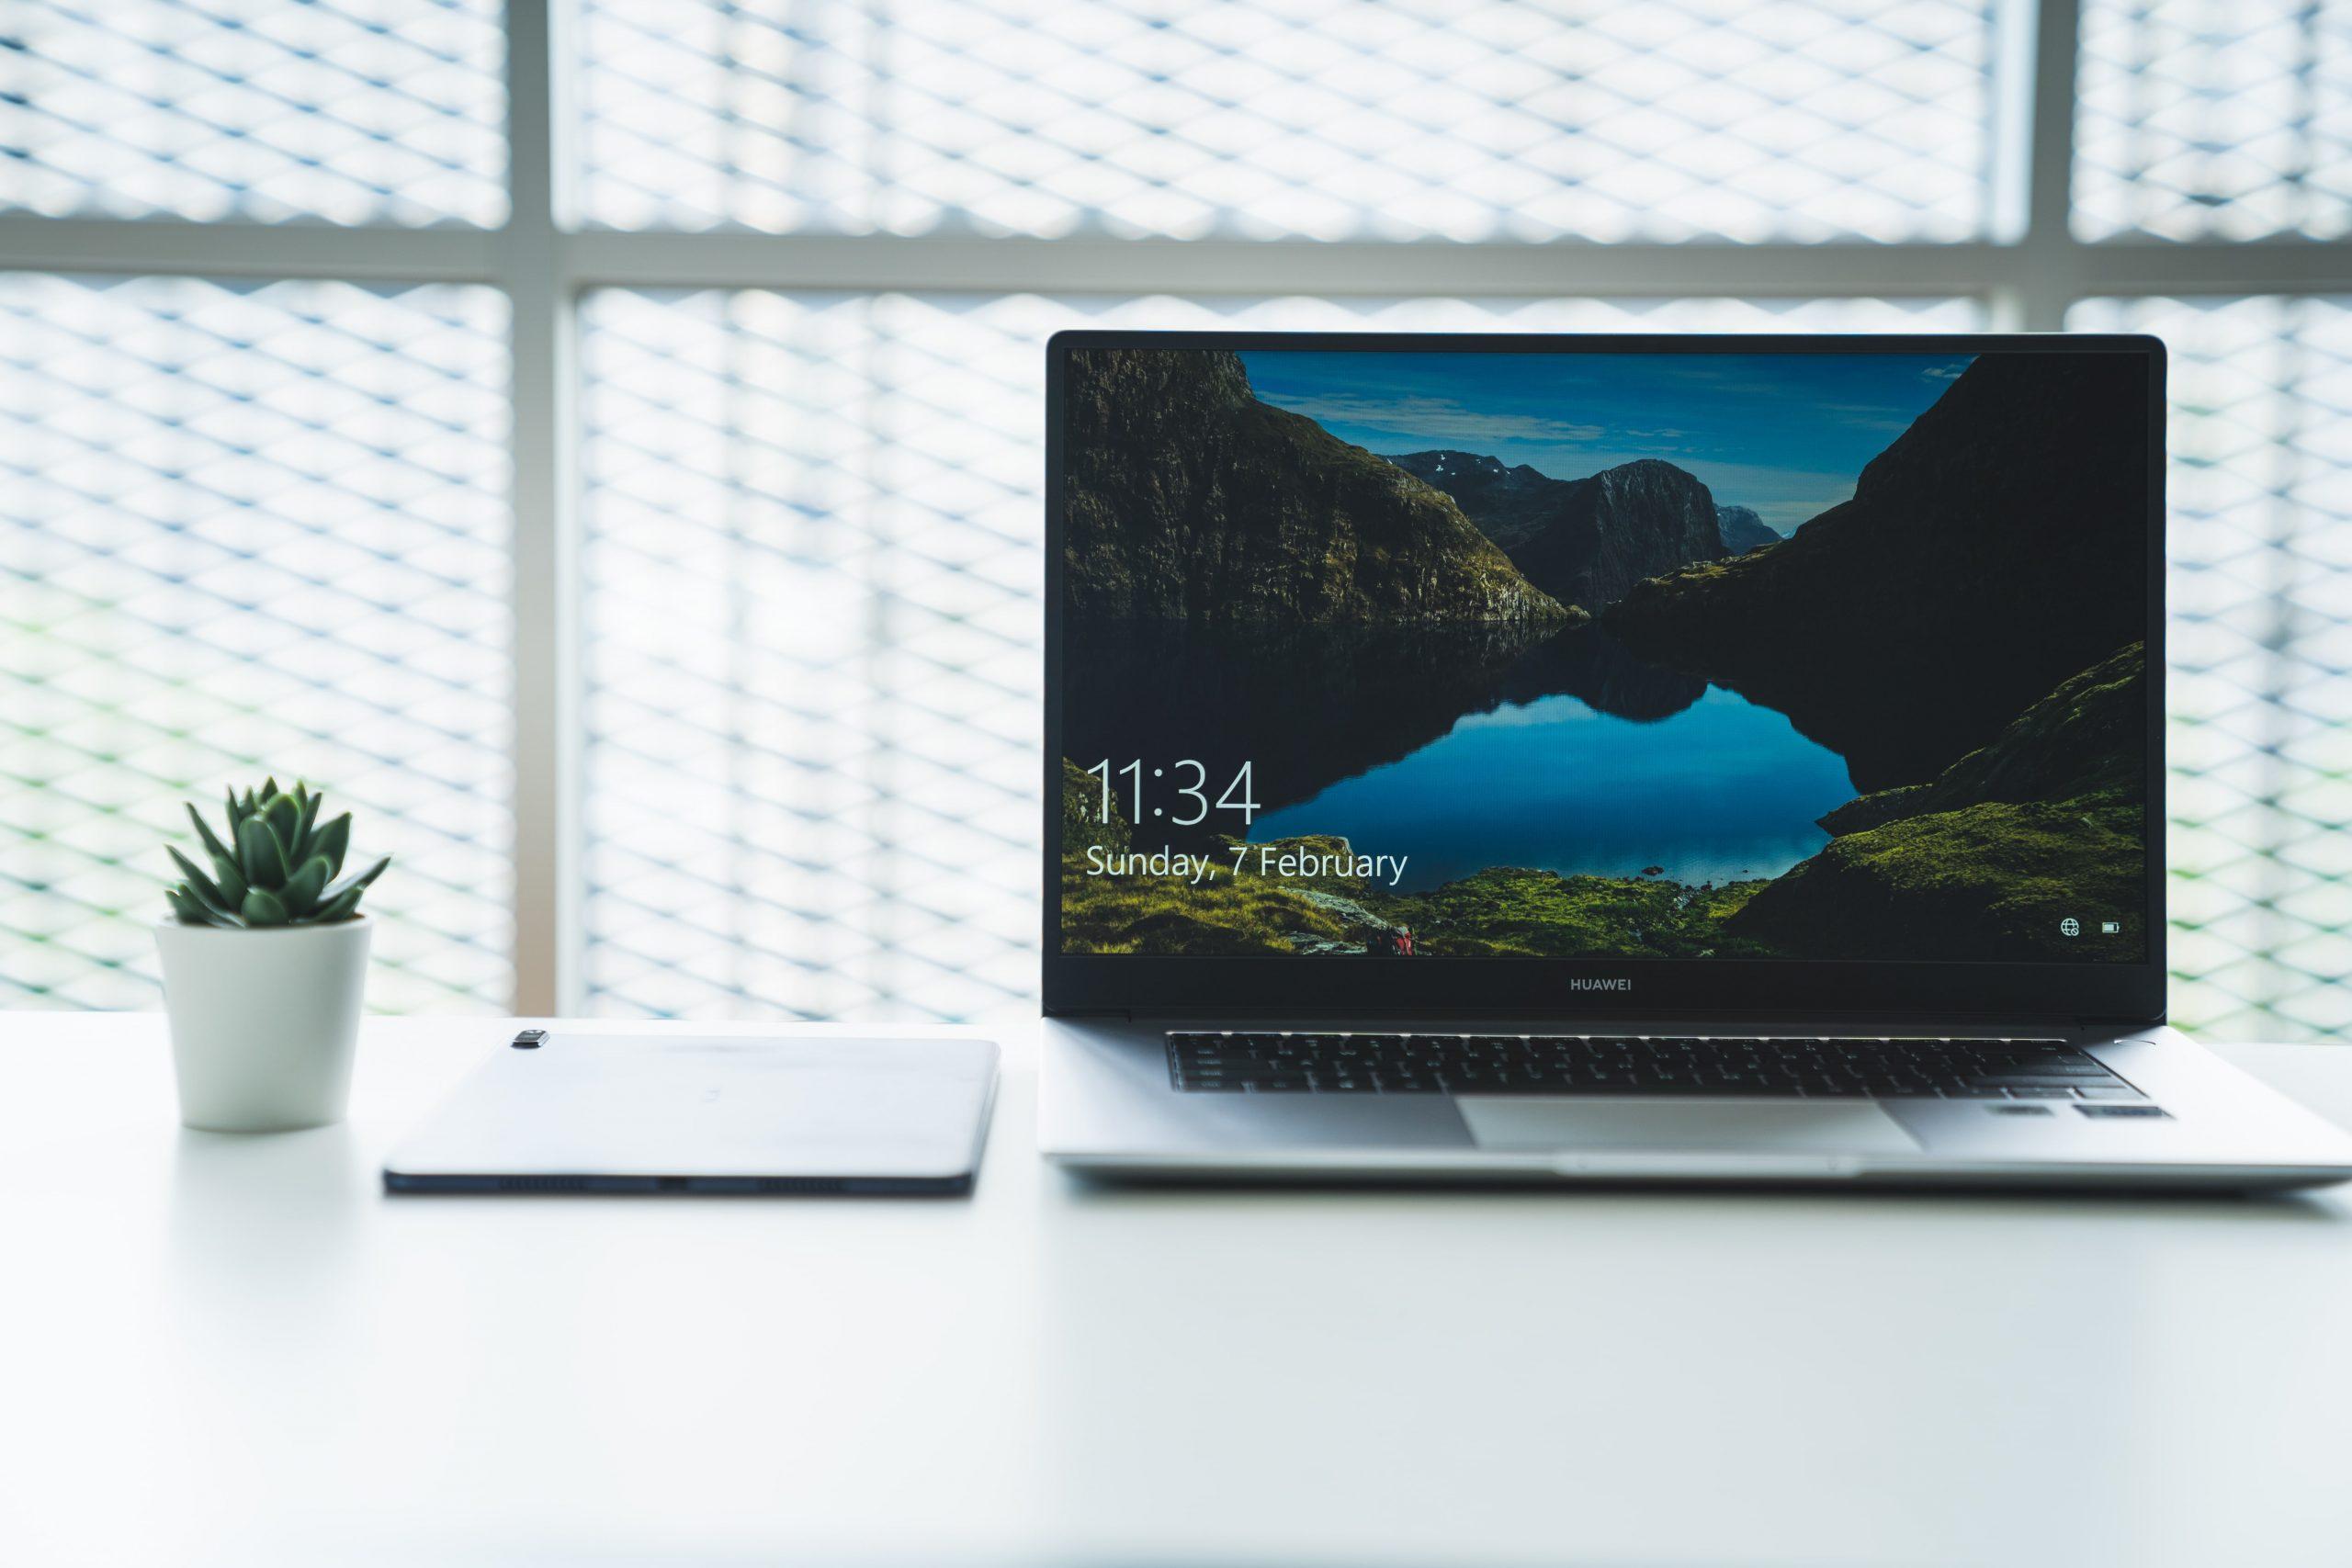 Pembelajaran Online Diteruskan? Tak Perlu Risau, Lengkapkan Diri Dengan Komputer Riba Terbaru HUAWEI MateBook D15 i3! 4